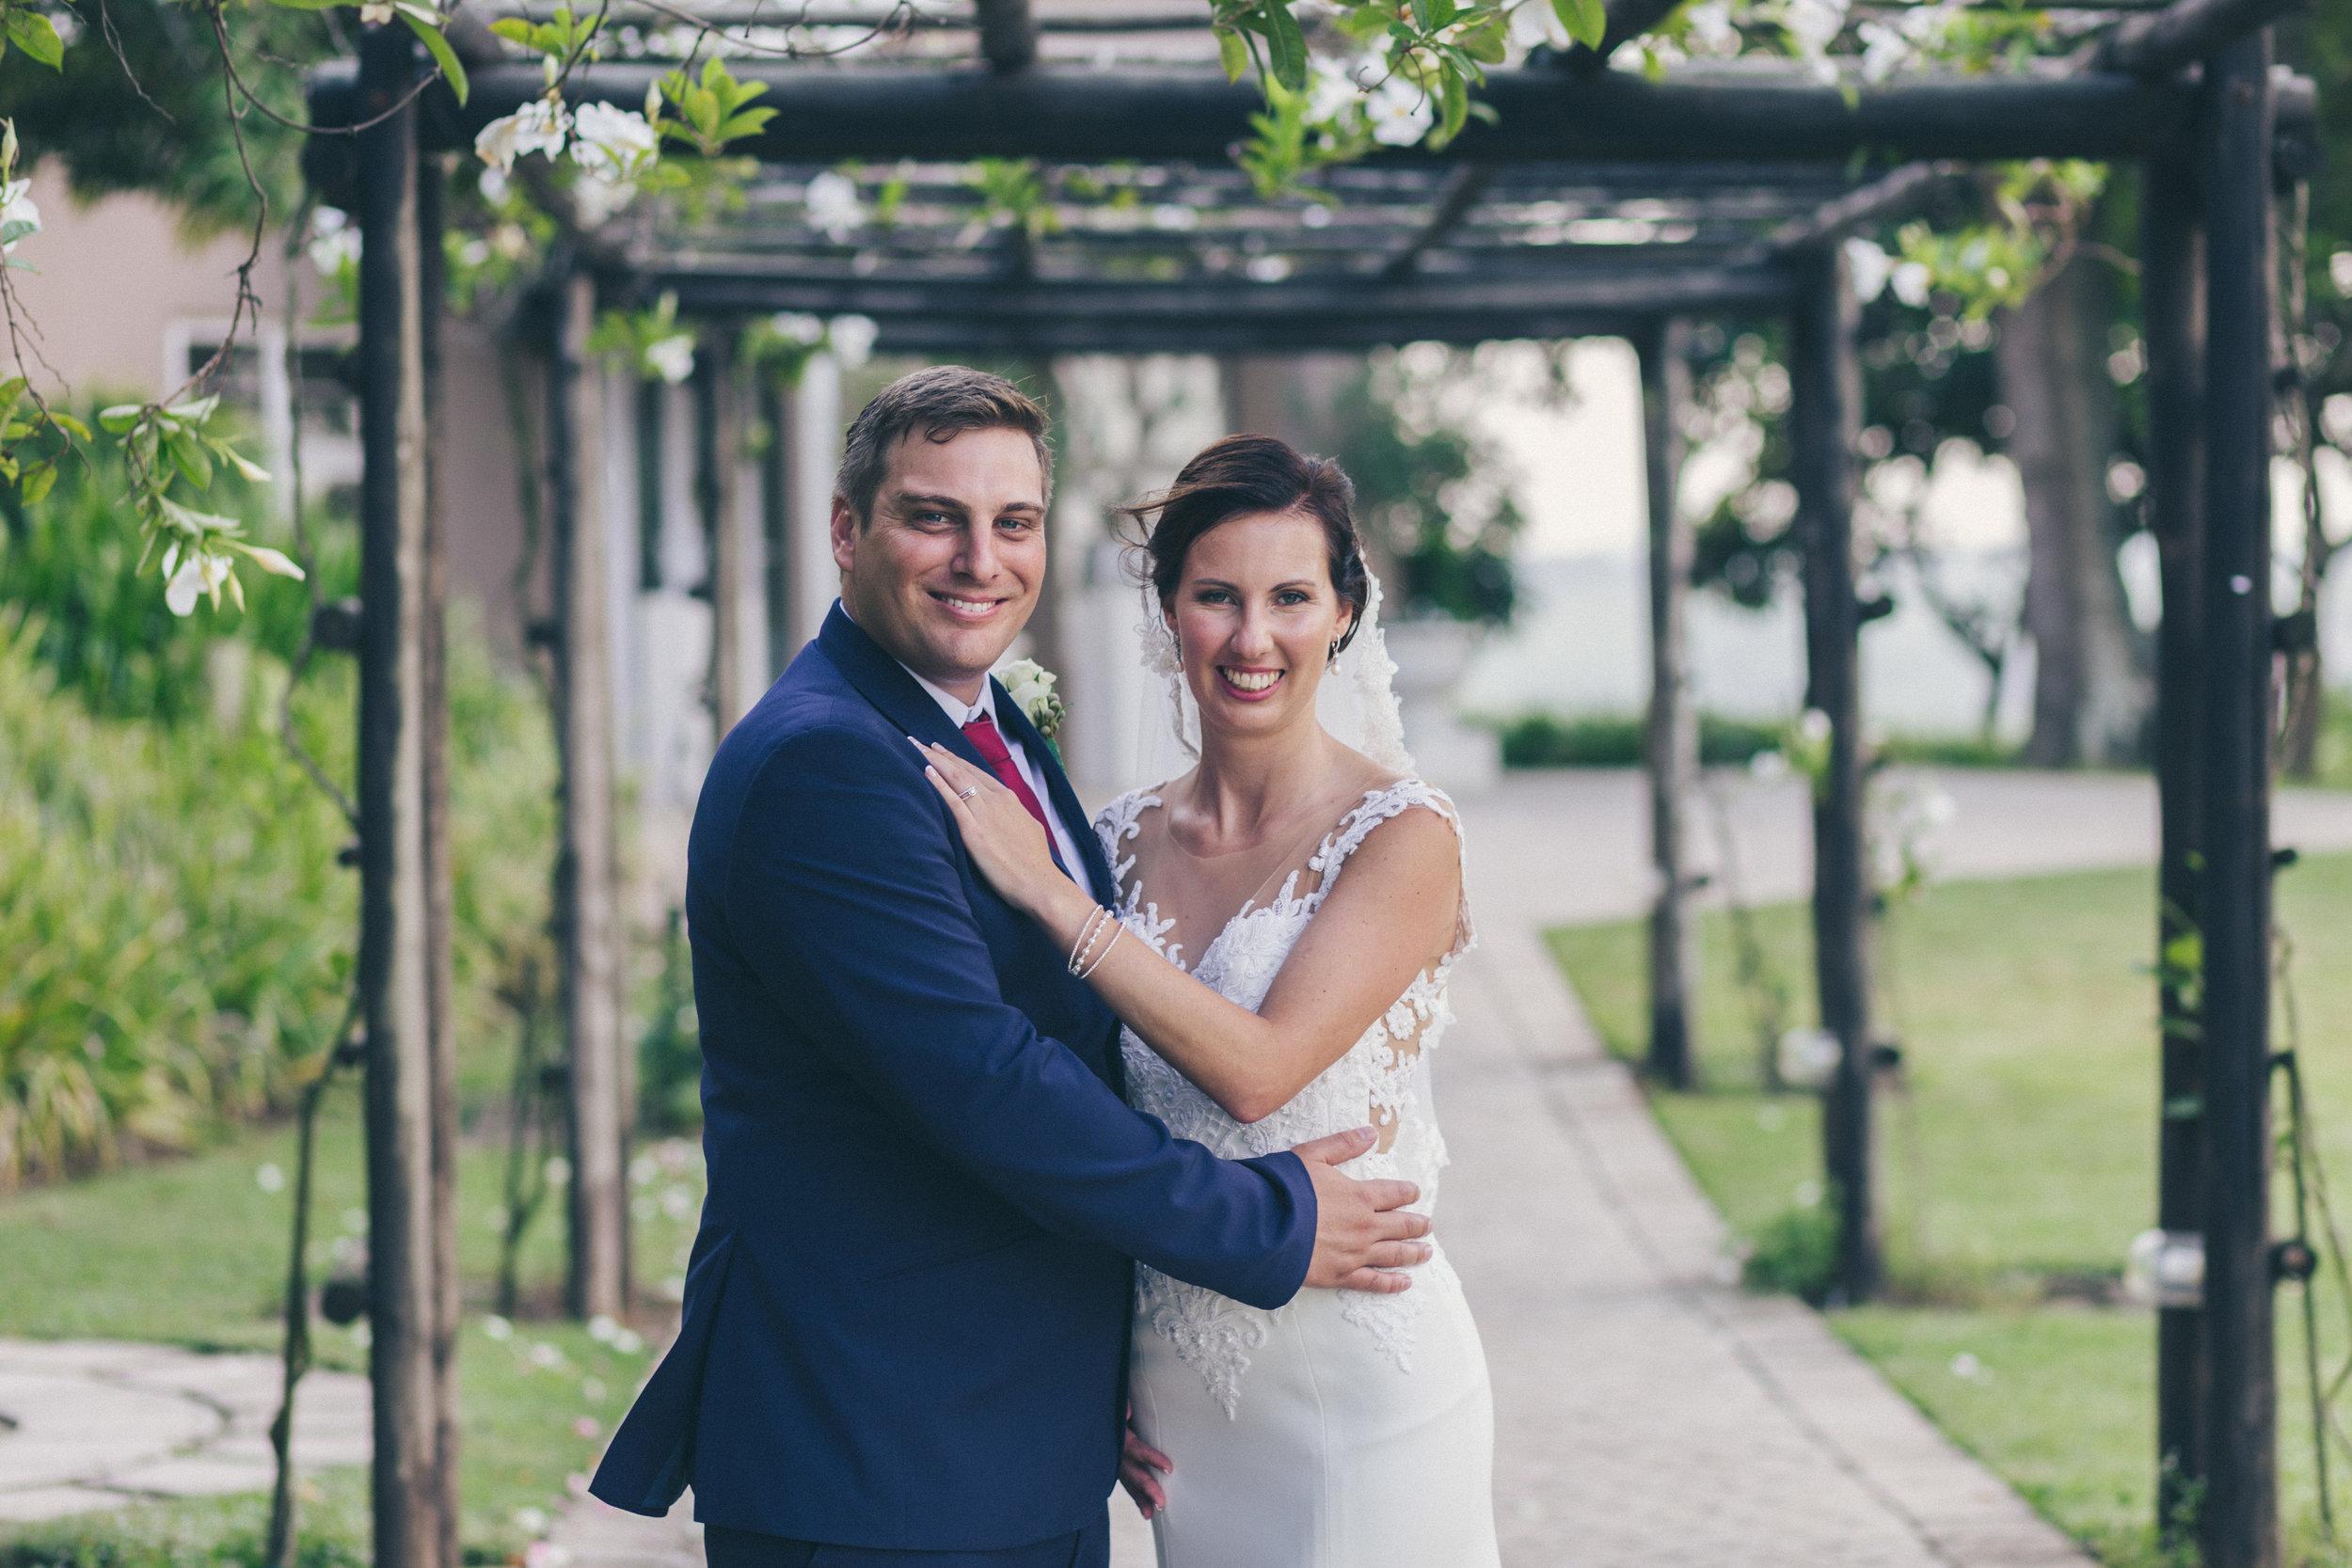 Liezl & Rudy Wedding-340.jpg